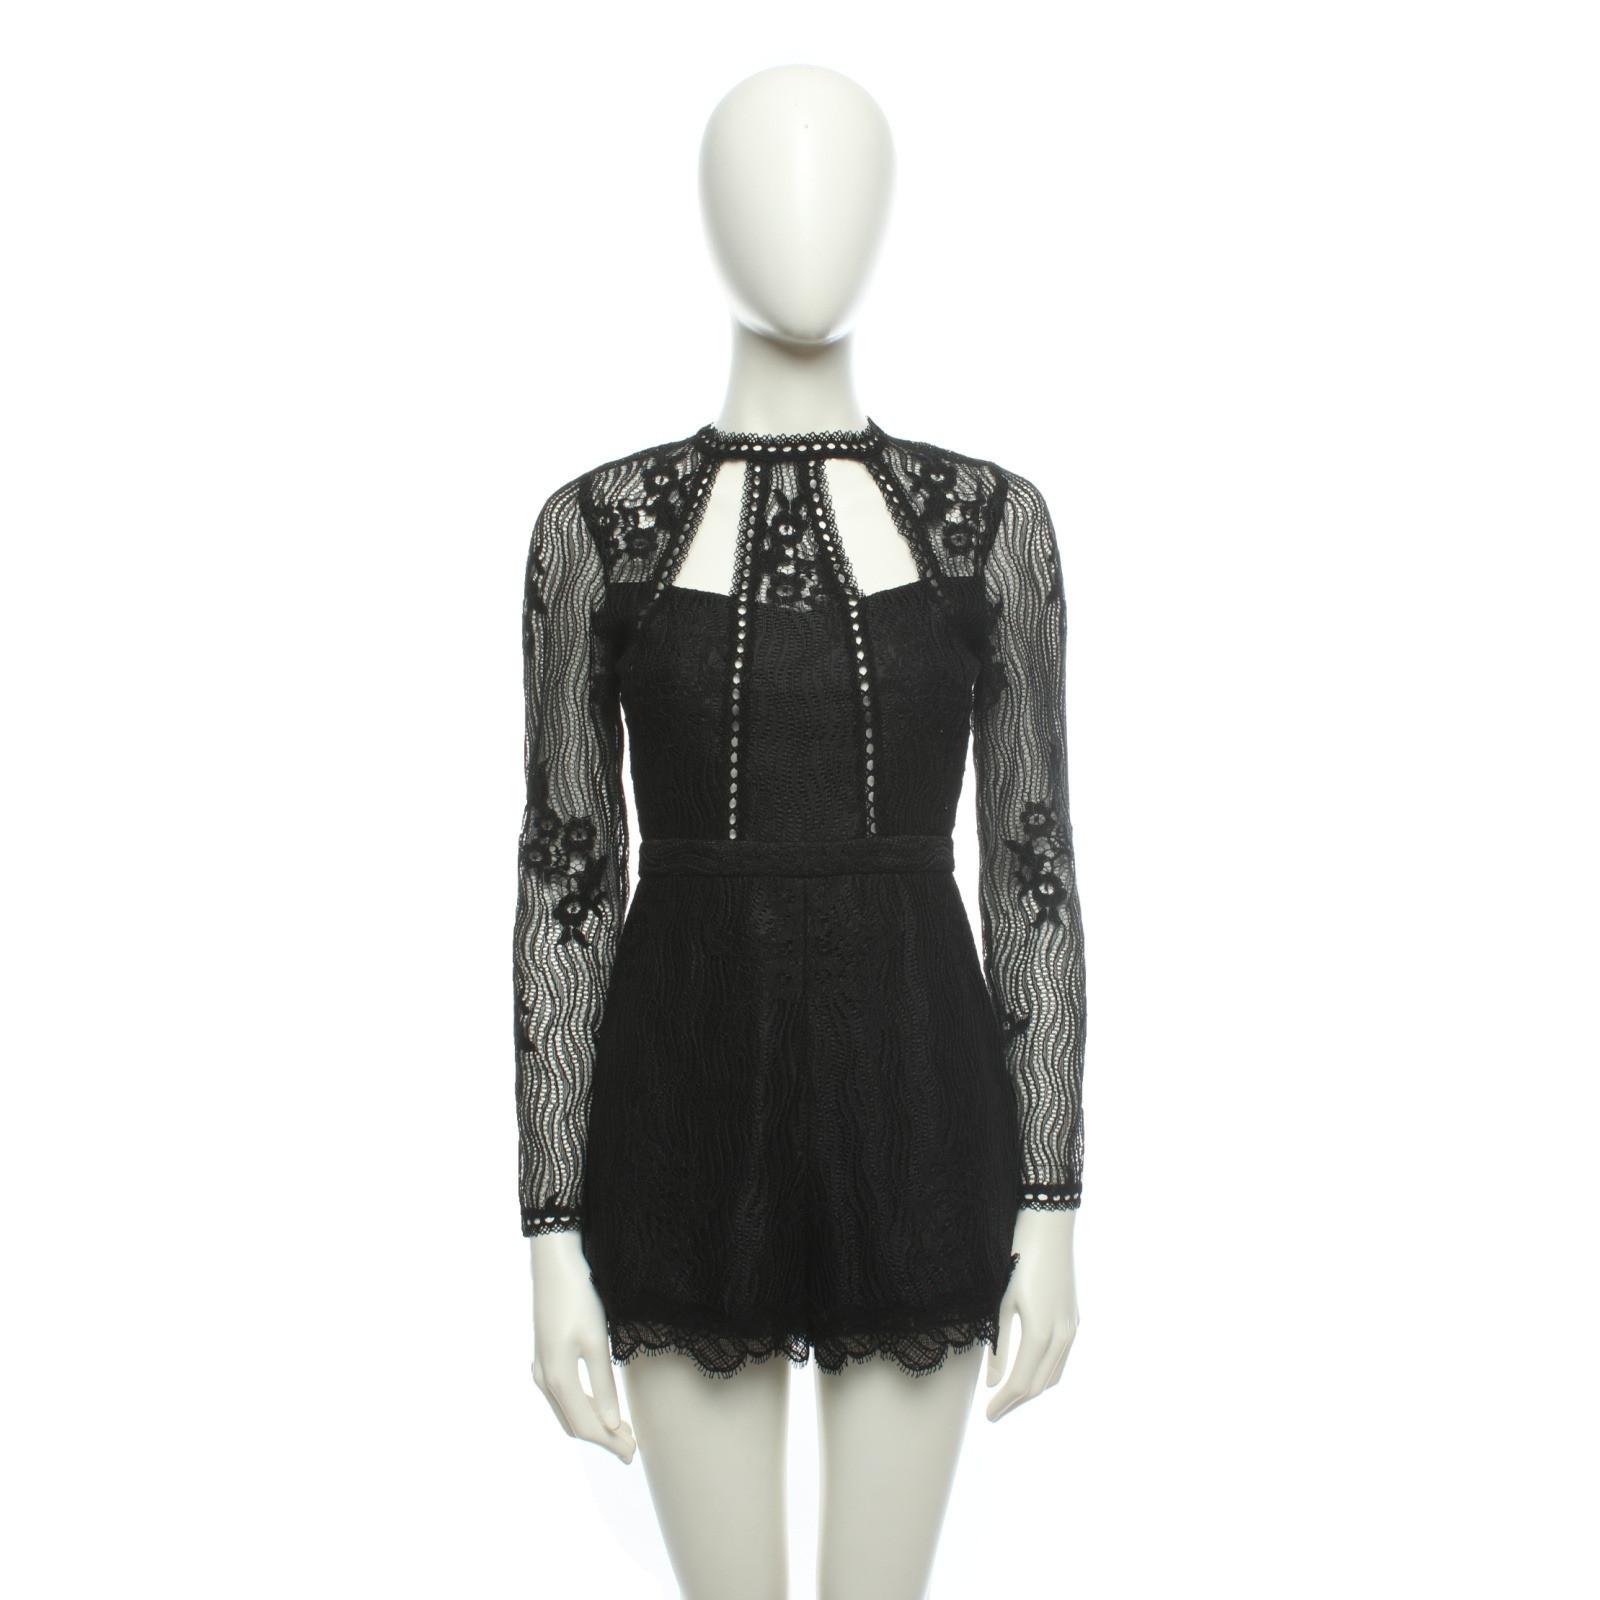 alexis jumpsuit in schwarz - second hand alexis jumpsuit in